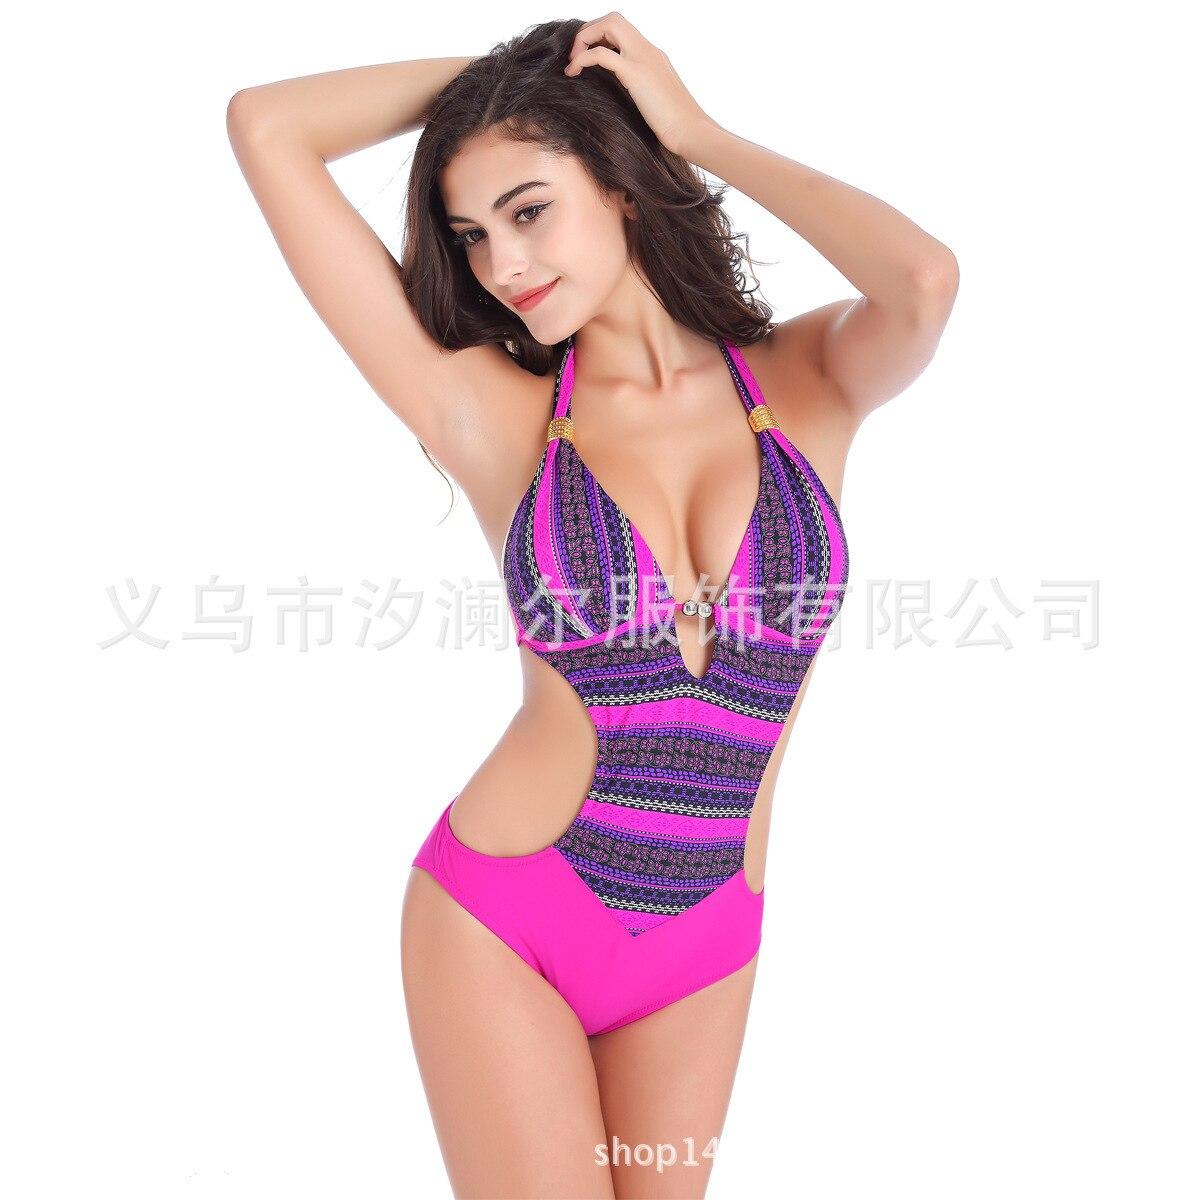 Womens Swim Wear 2018 Summer Sexy One Piece Monokini Swimsuit Bodysuit Backless High Elastic Beach Wear Bathing Suit ...